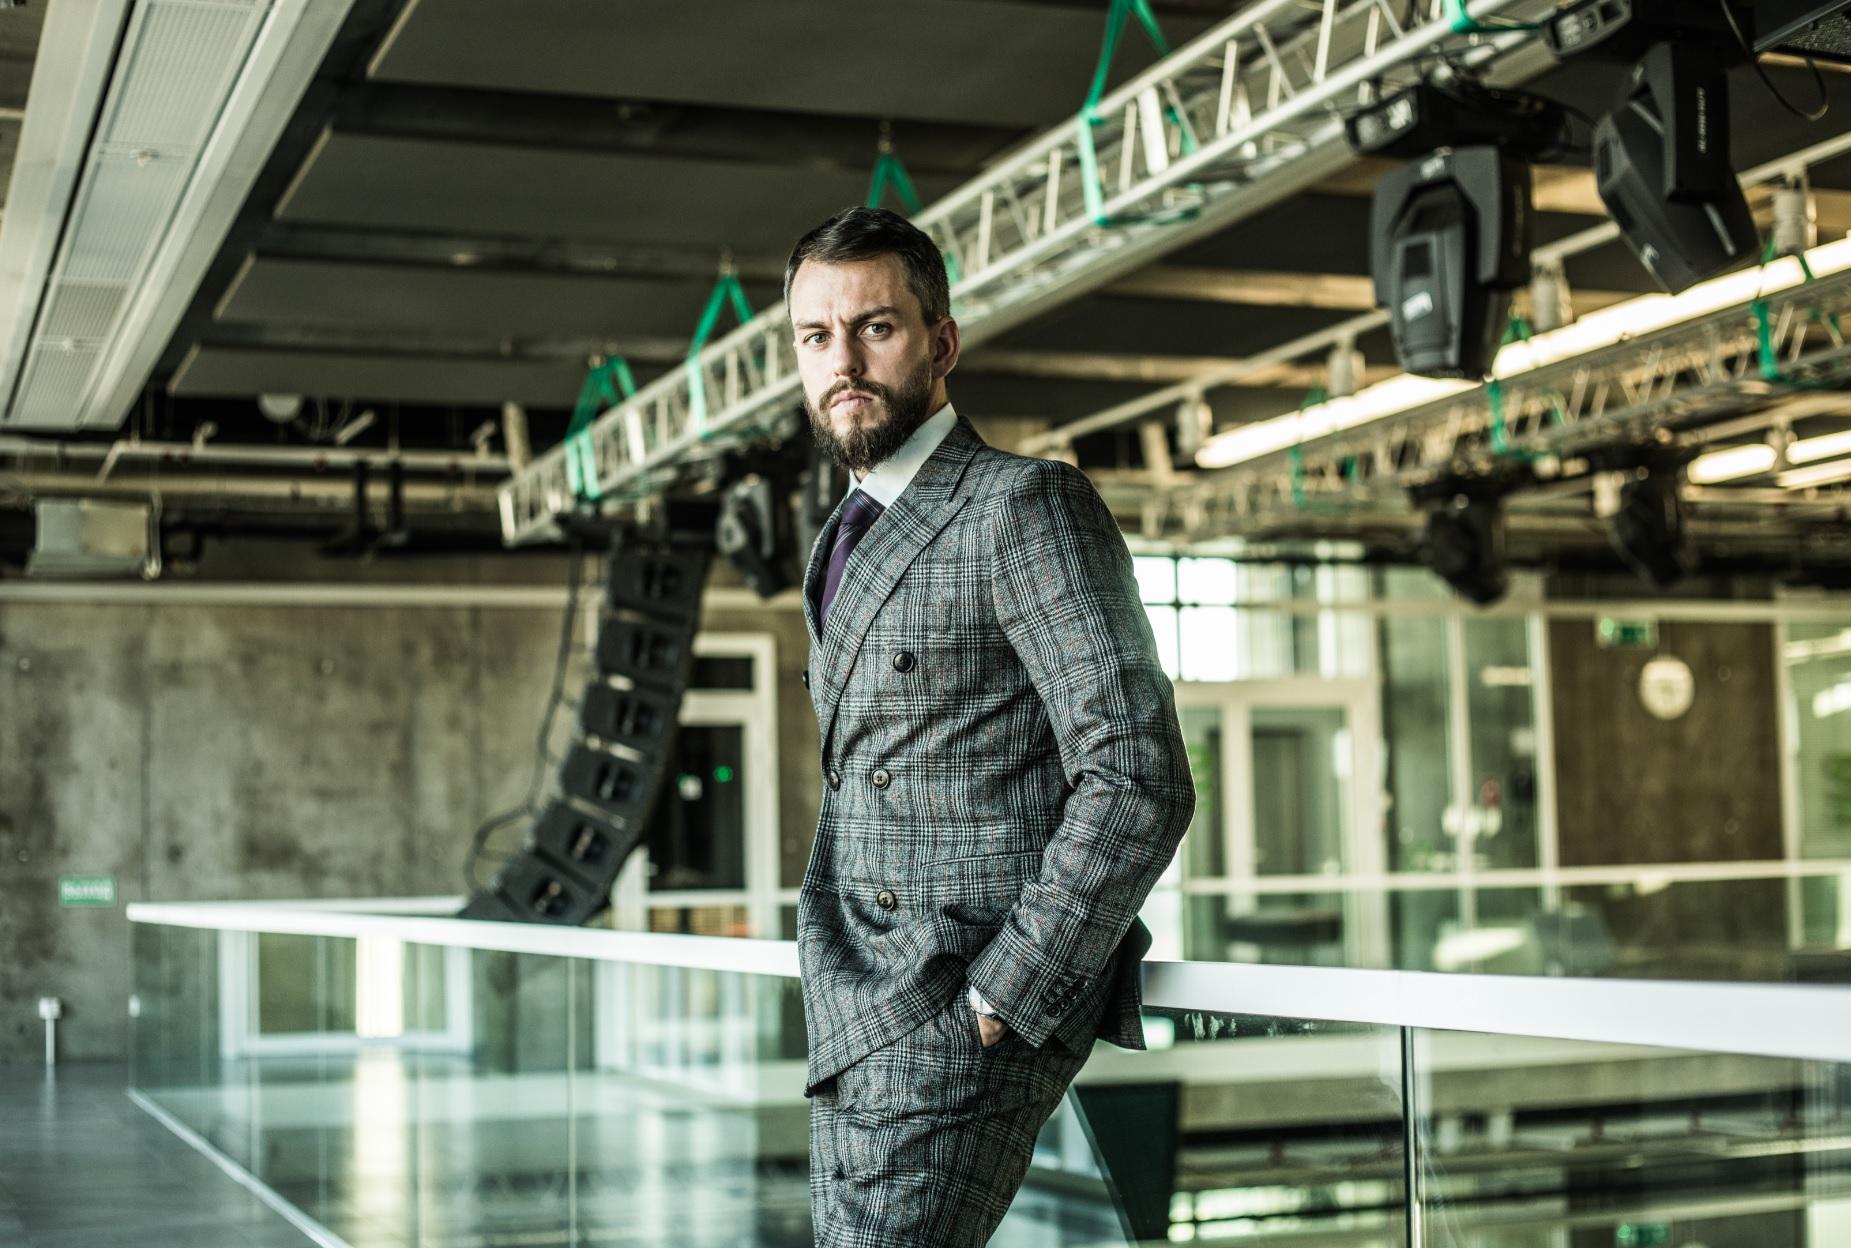 Cybercrime specialist Group-IB opens Dubai office